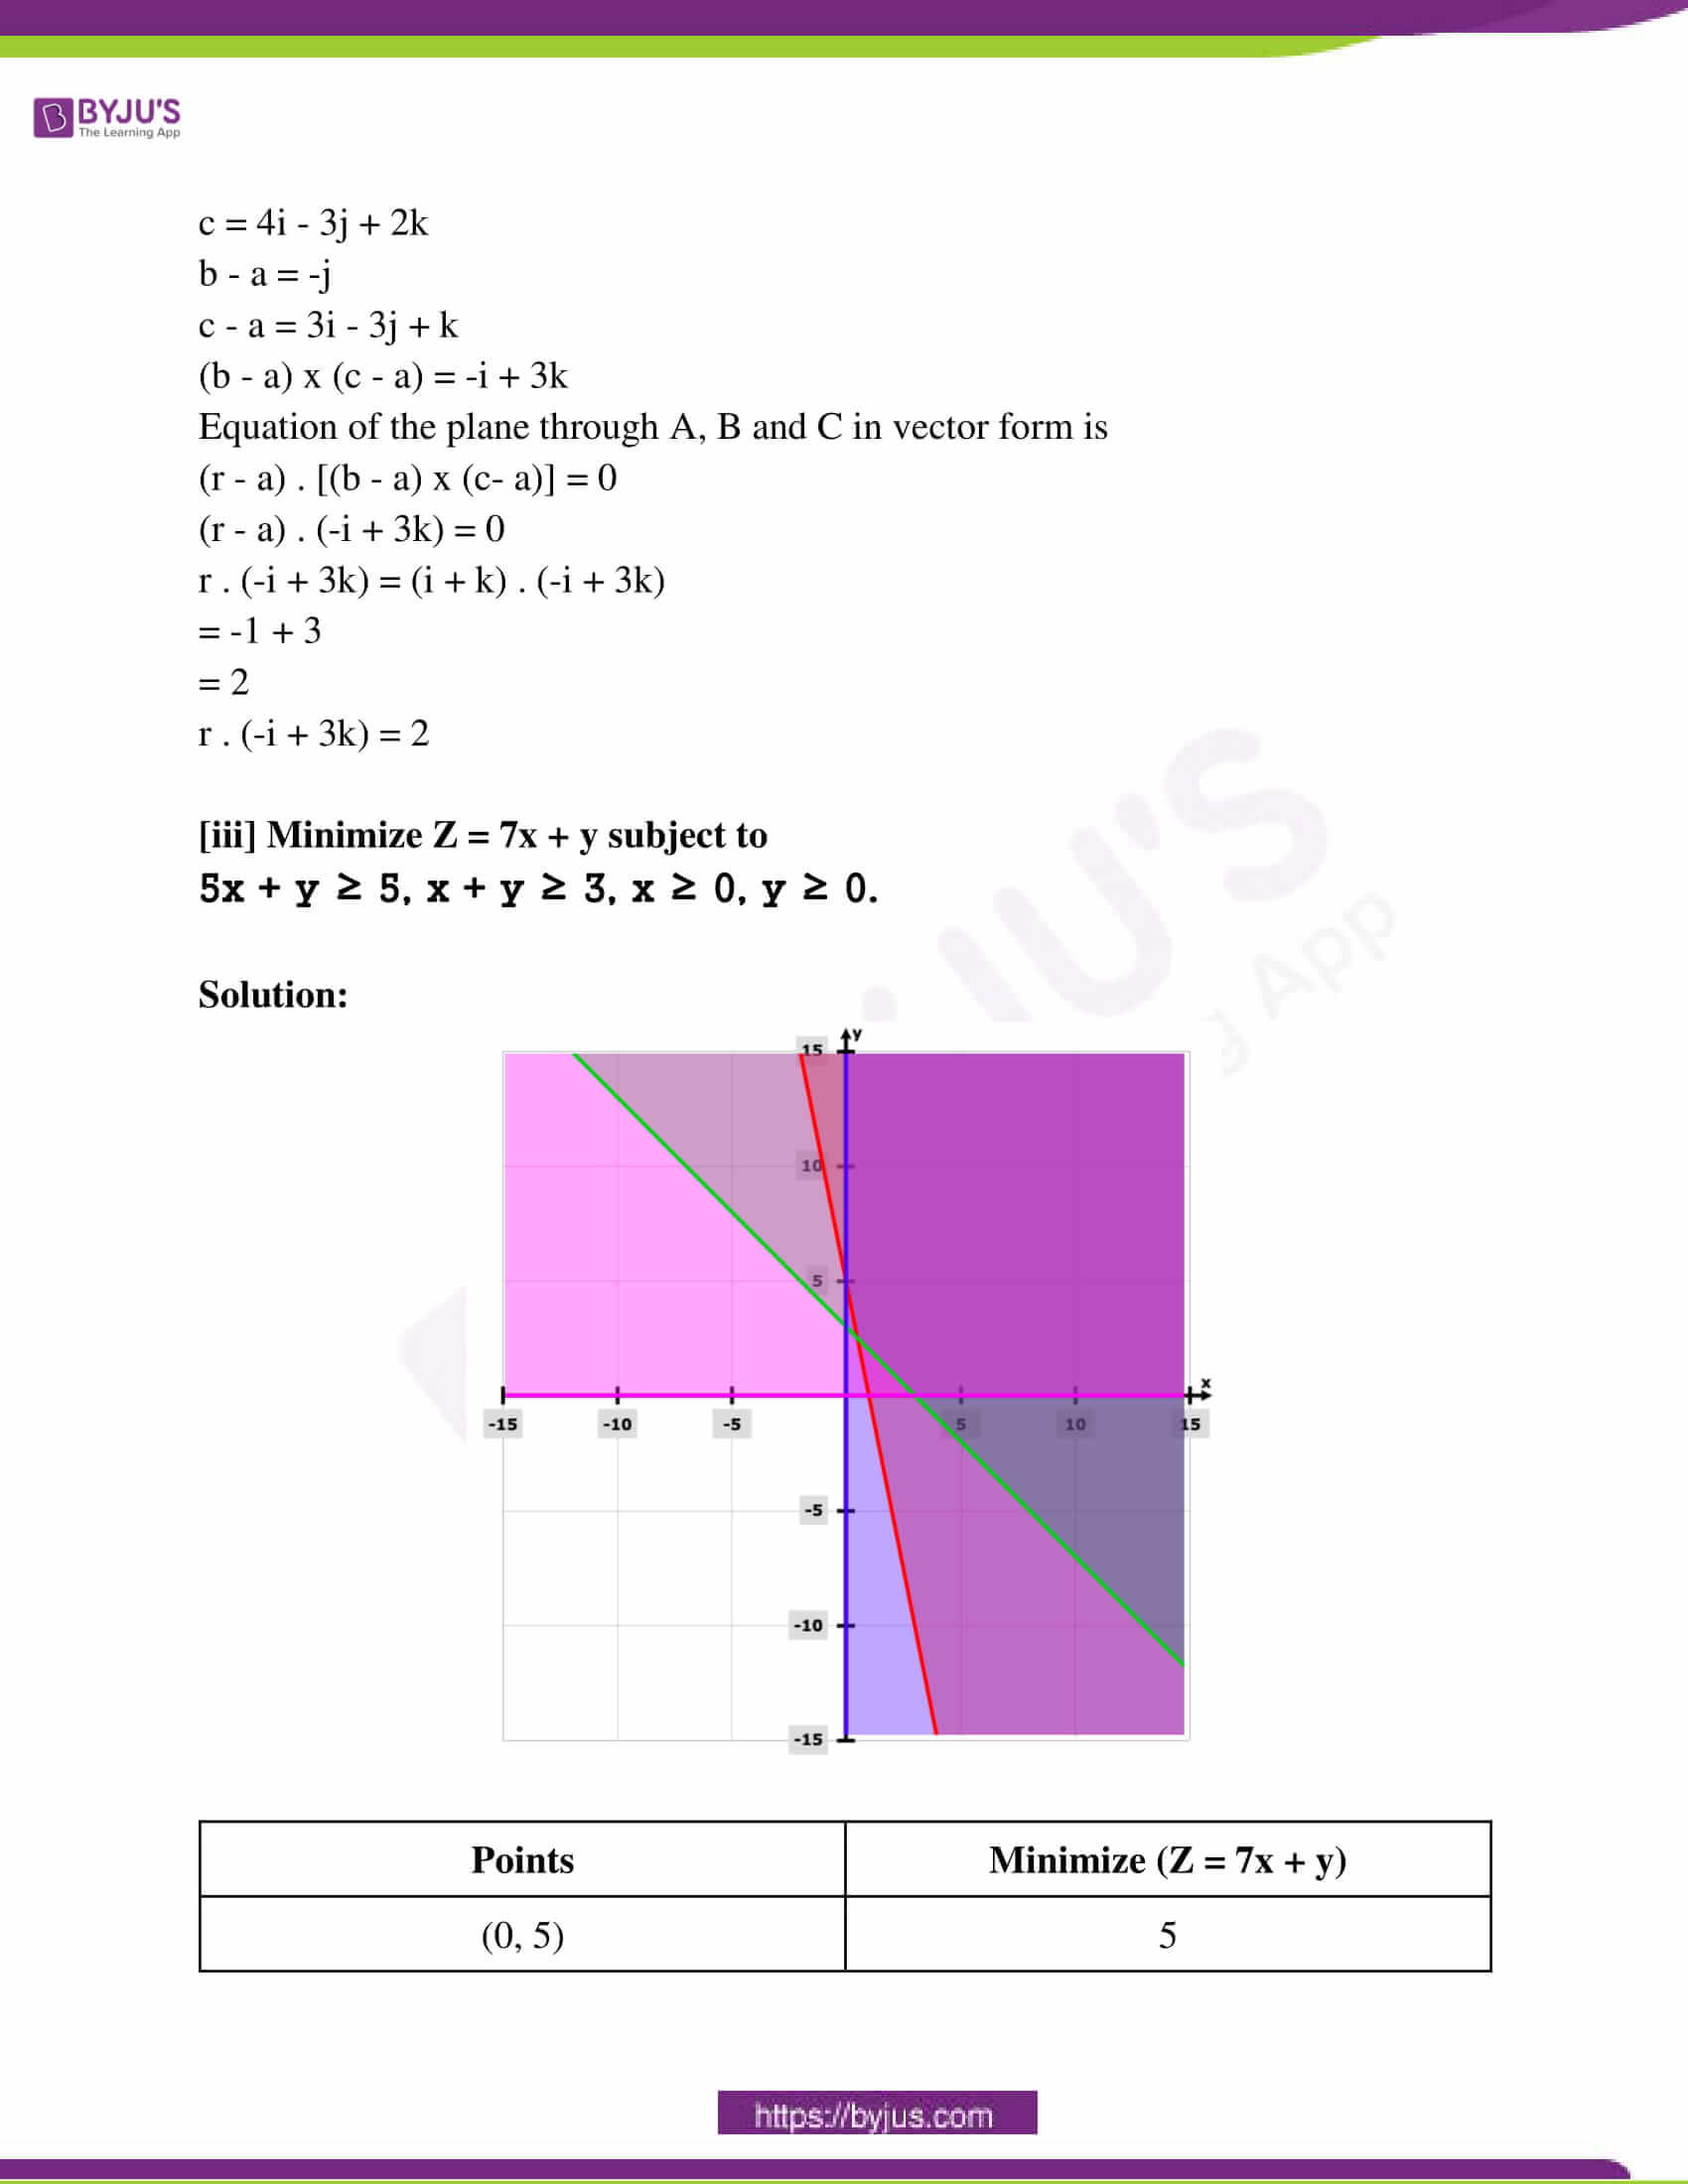 maharashtra class 12 exam question paper solutions march 2018 13